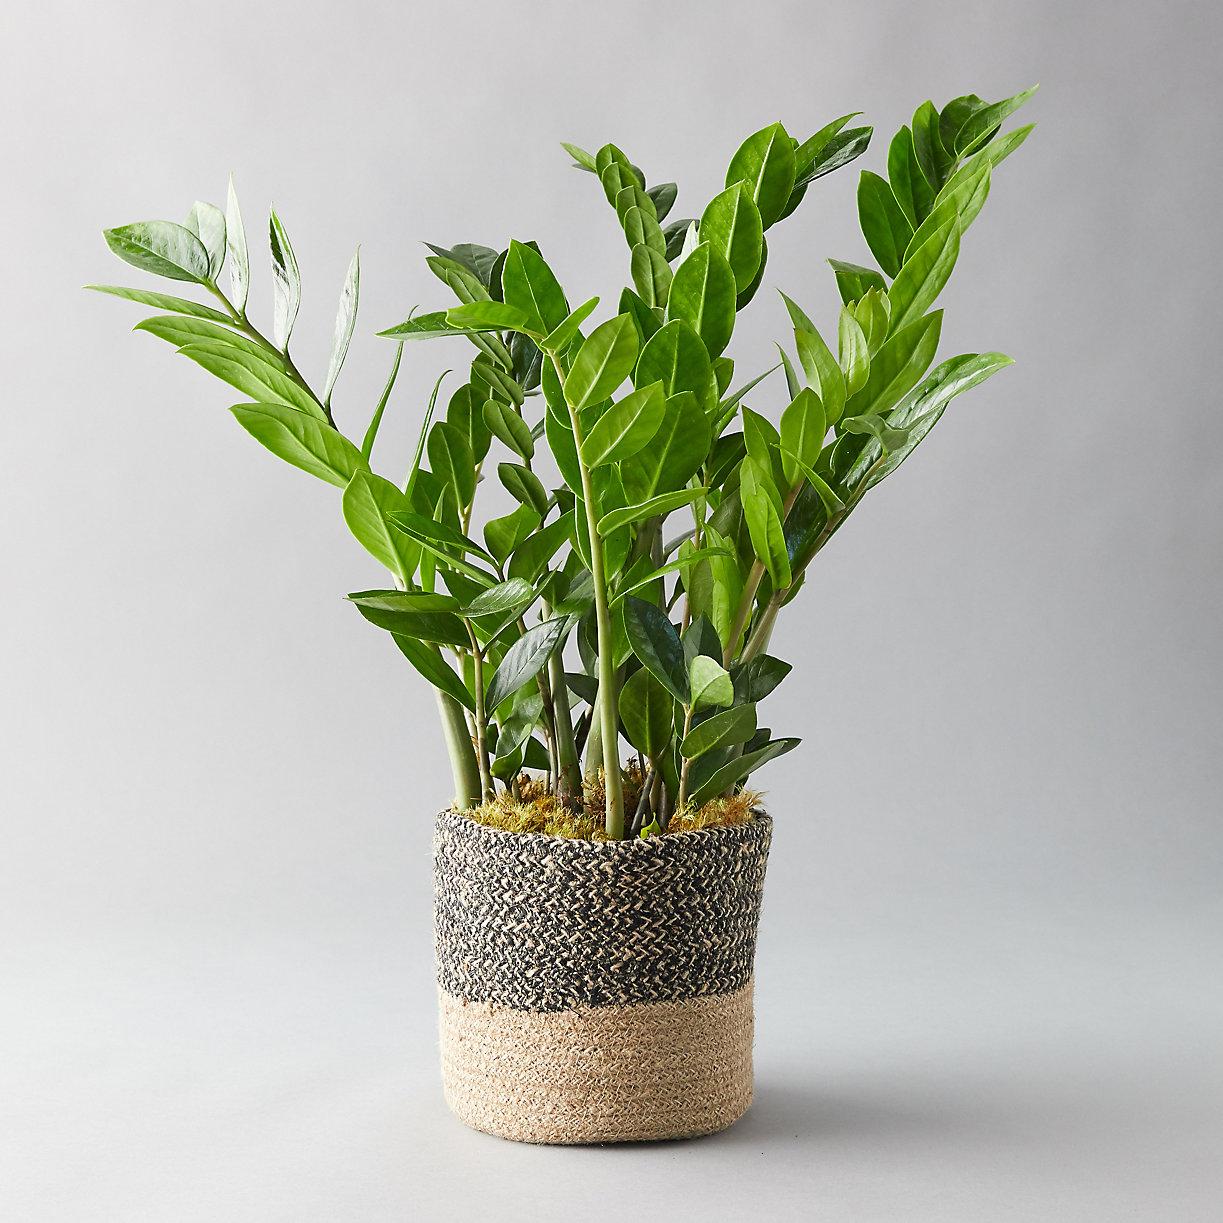 ZZ Plant, Jute Pot - Terrain on african violets care, dwarf umbrella tree care, pets care, plant care, geraniums care, flower care, landscaping care,